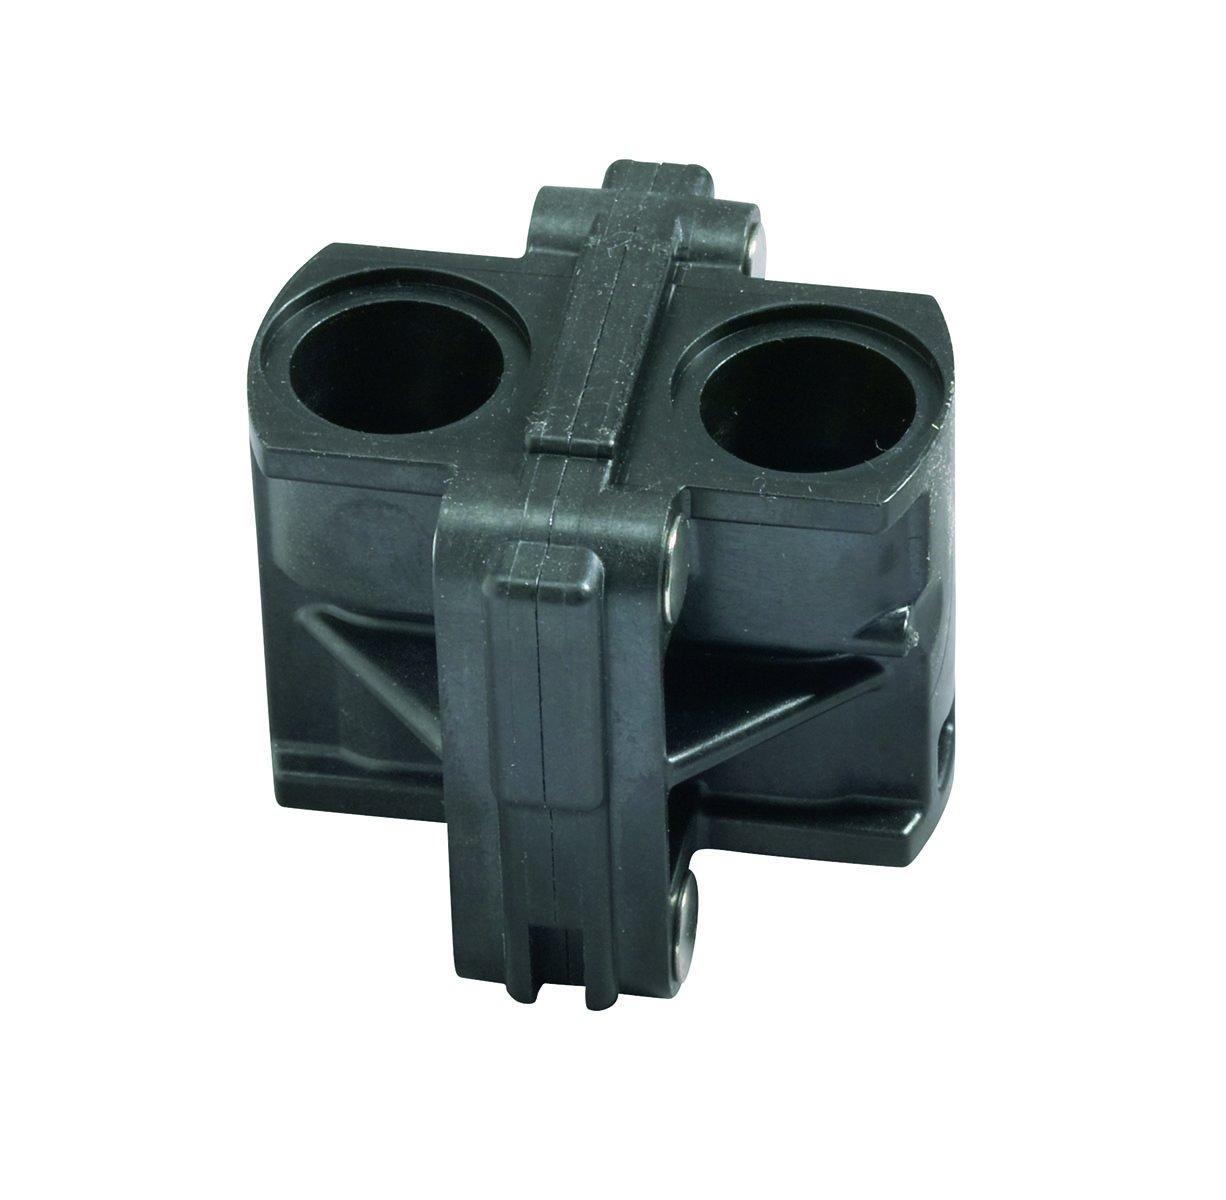 Kohler GP500520 Shower Pressure Balancing Unit KO-500520